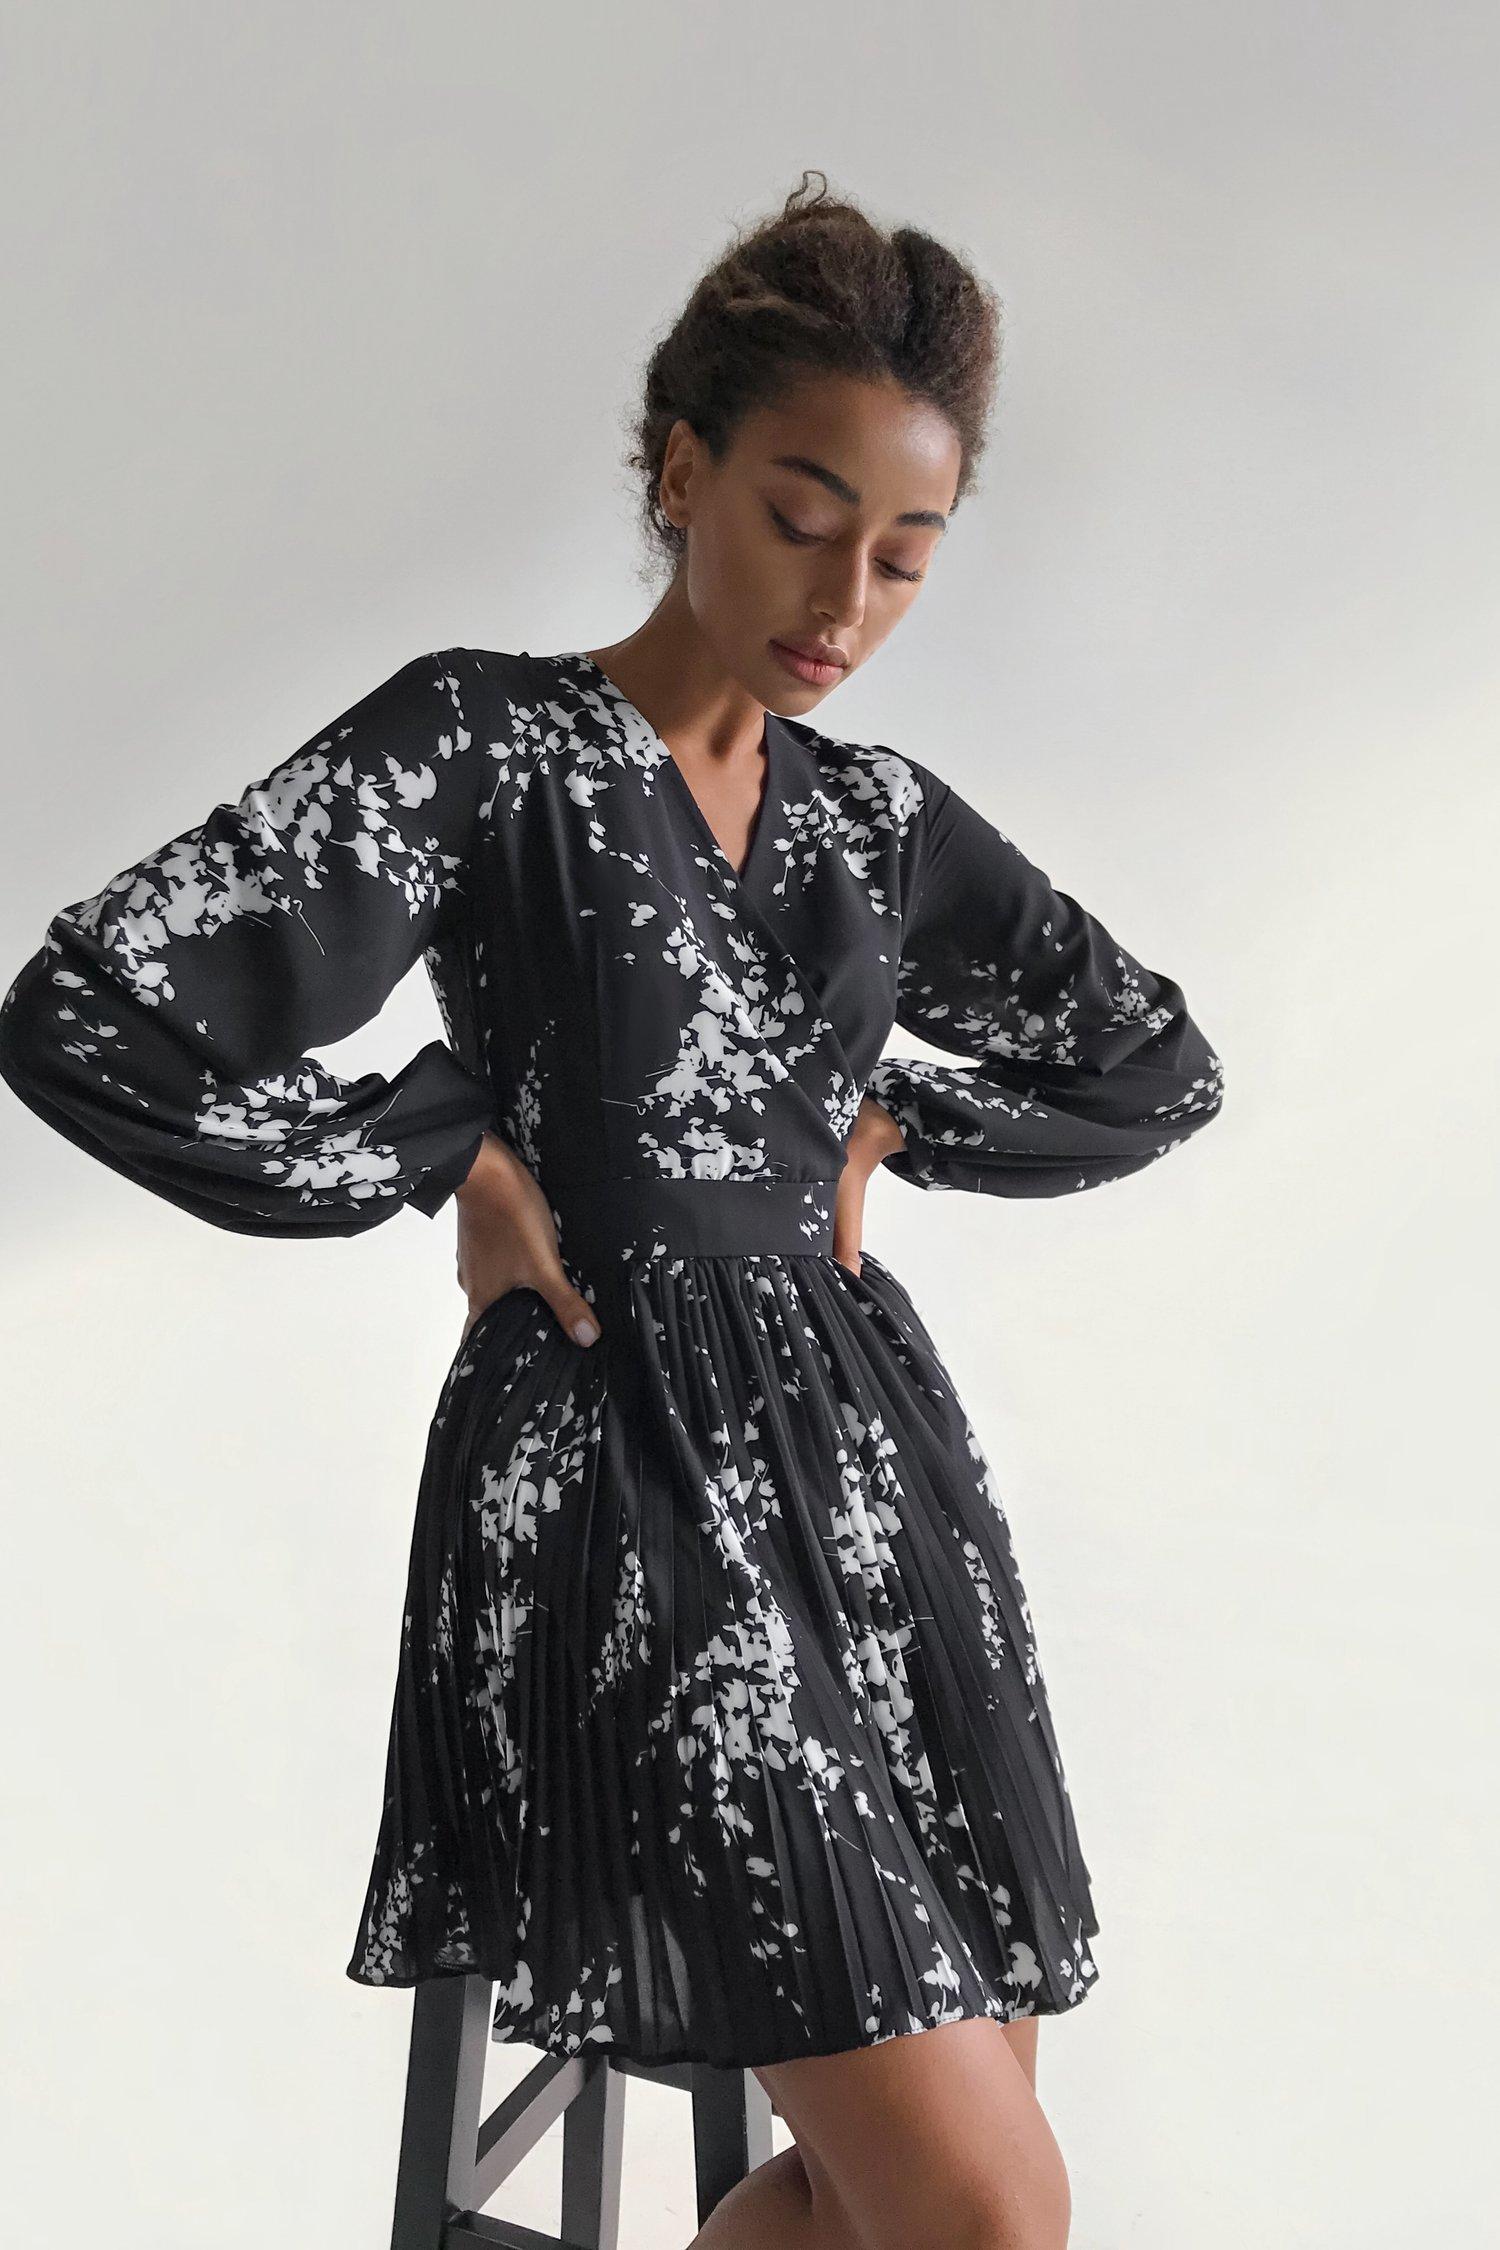 Платье мини черное Mystery flowers - THE LACE